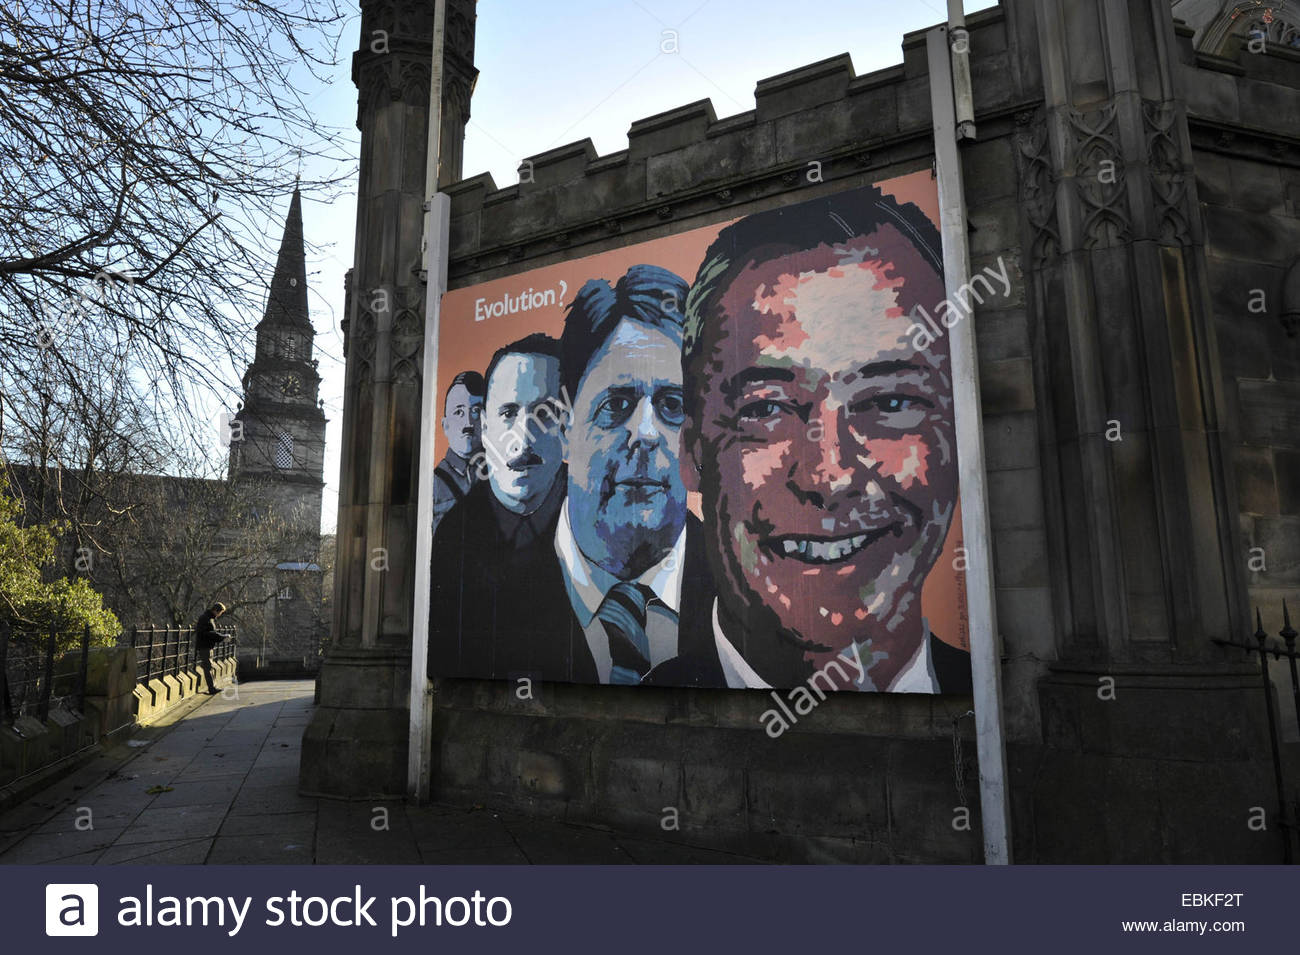 Edinburgh, UK. 2nd December, 2014. A mural depicting political leaders including Hitler and Nigel Farage painted - Stock Image